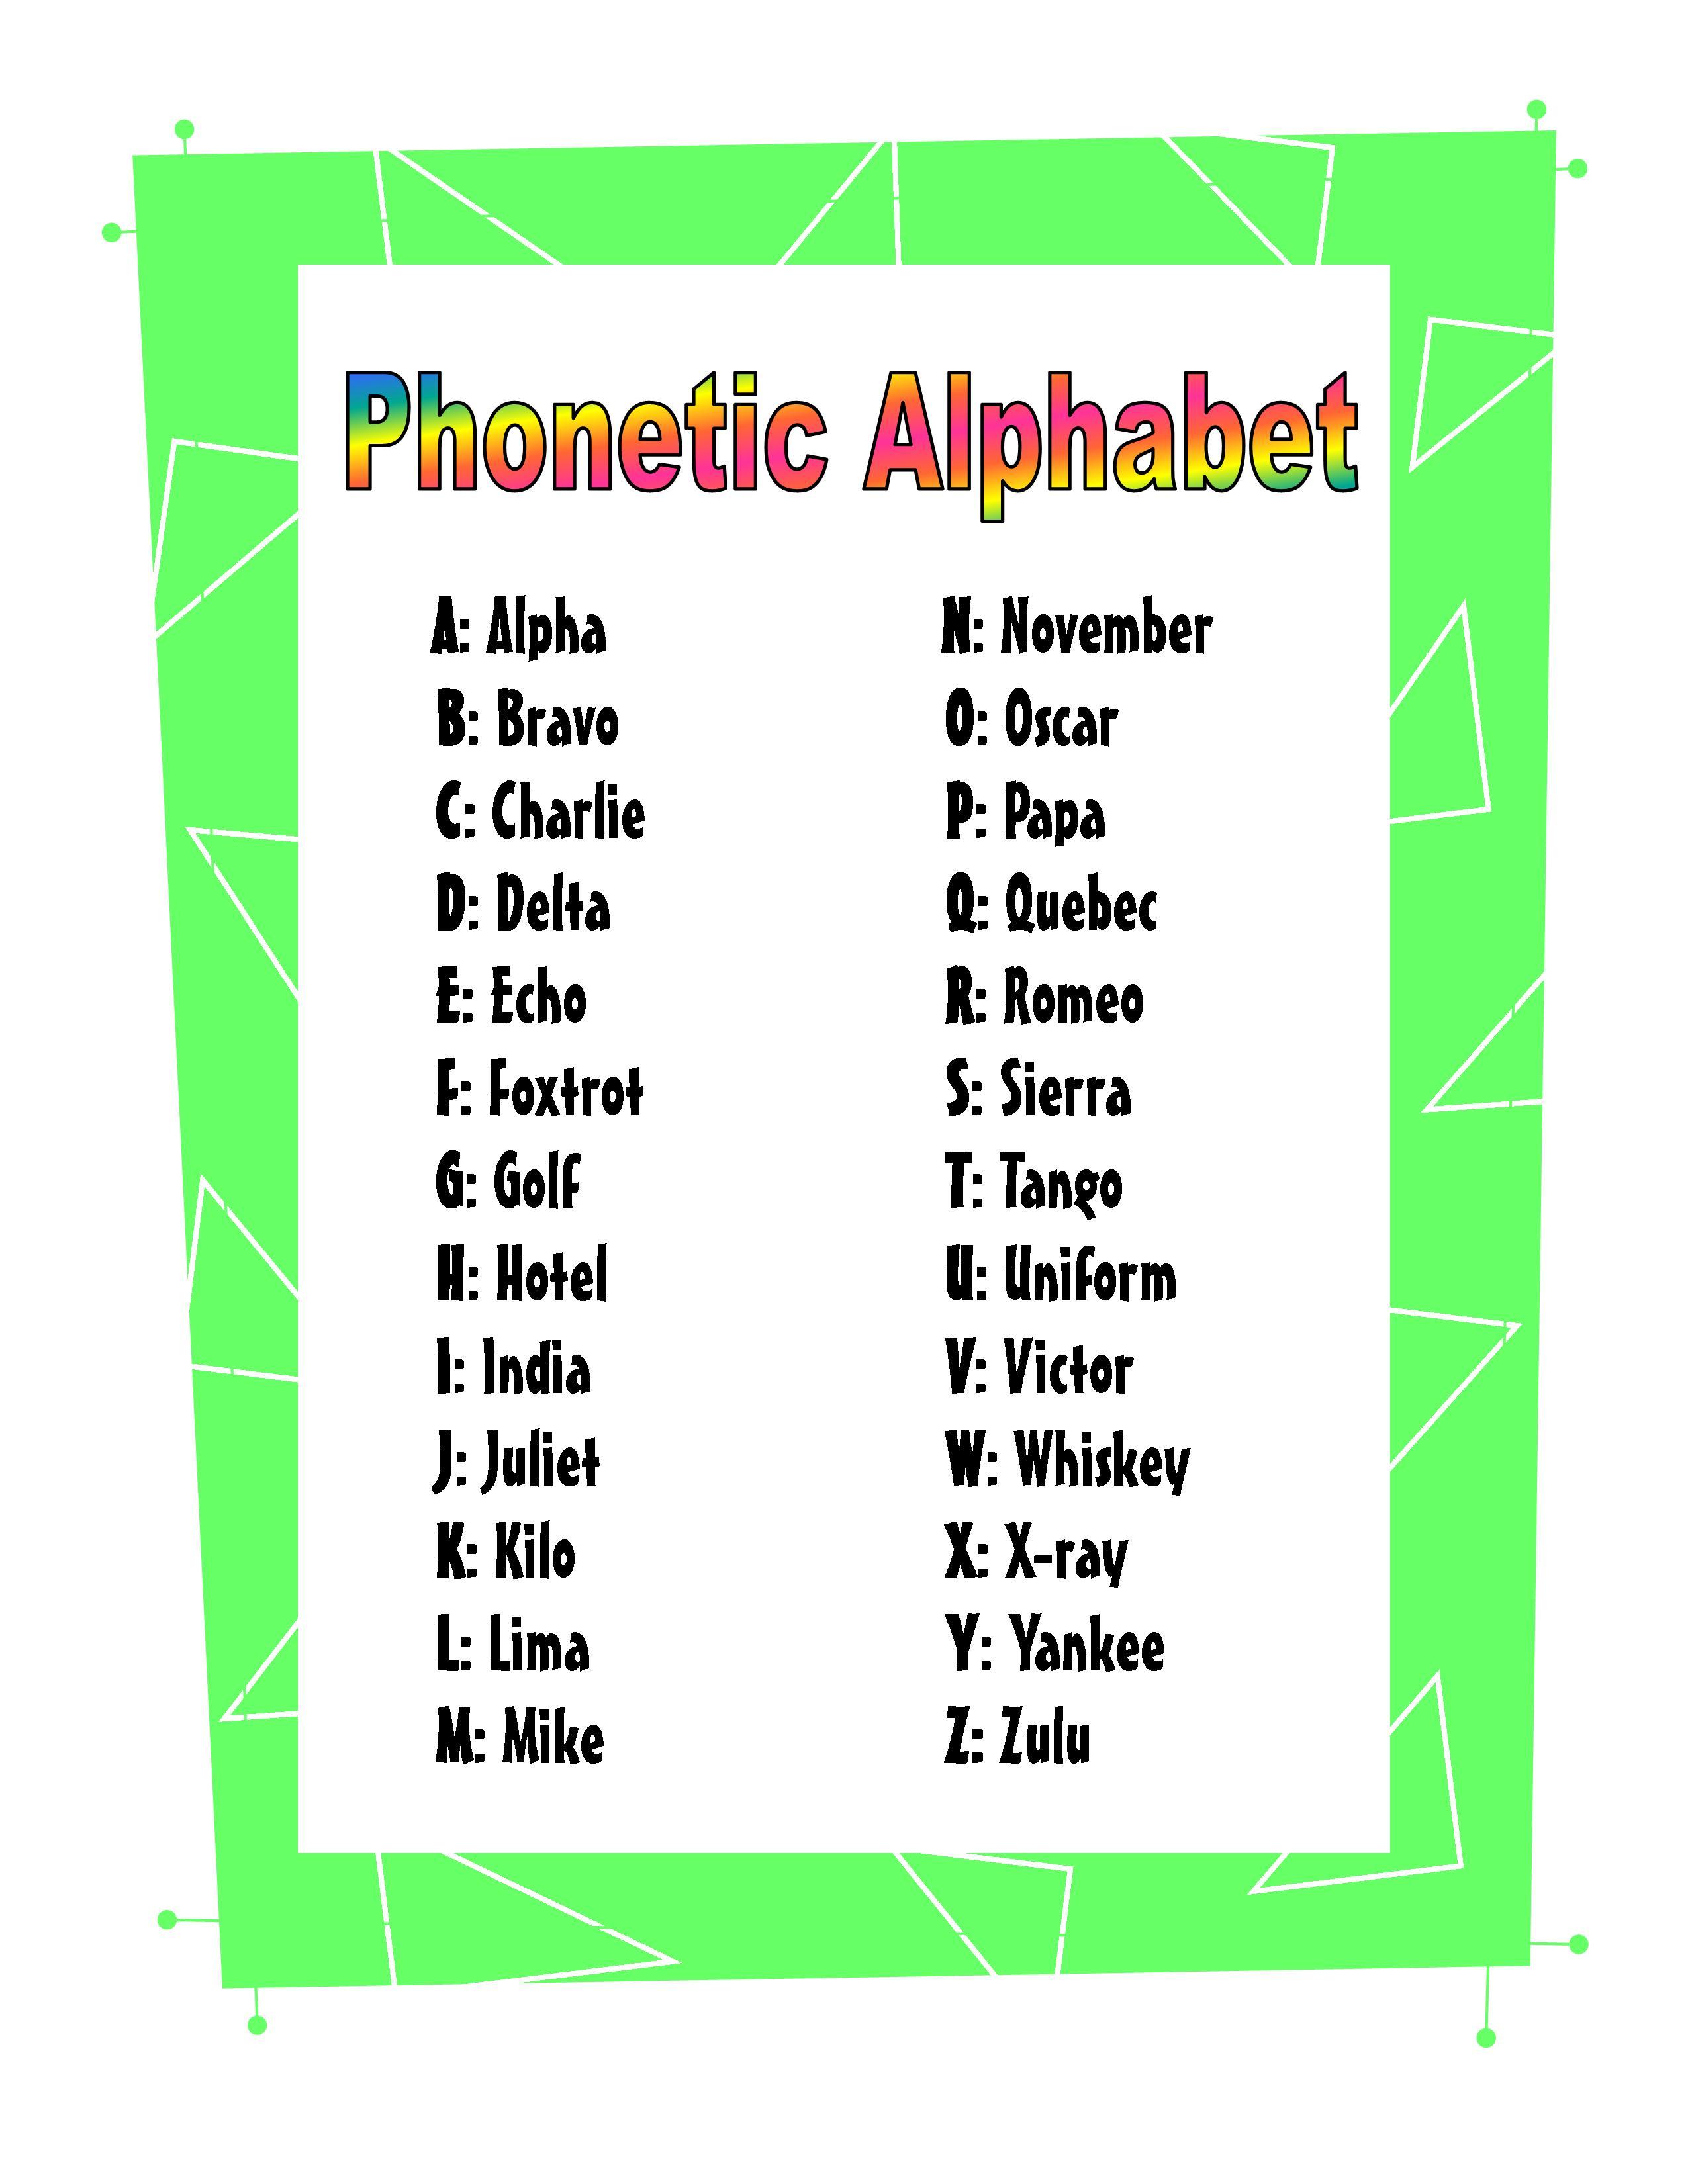 49 Phonetic Alphabet Wallpaper On Wallpapersafari